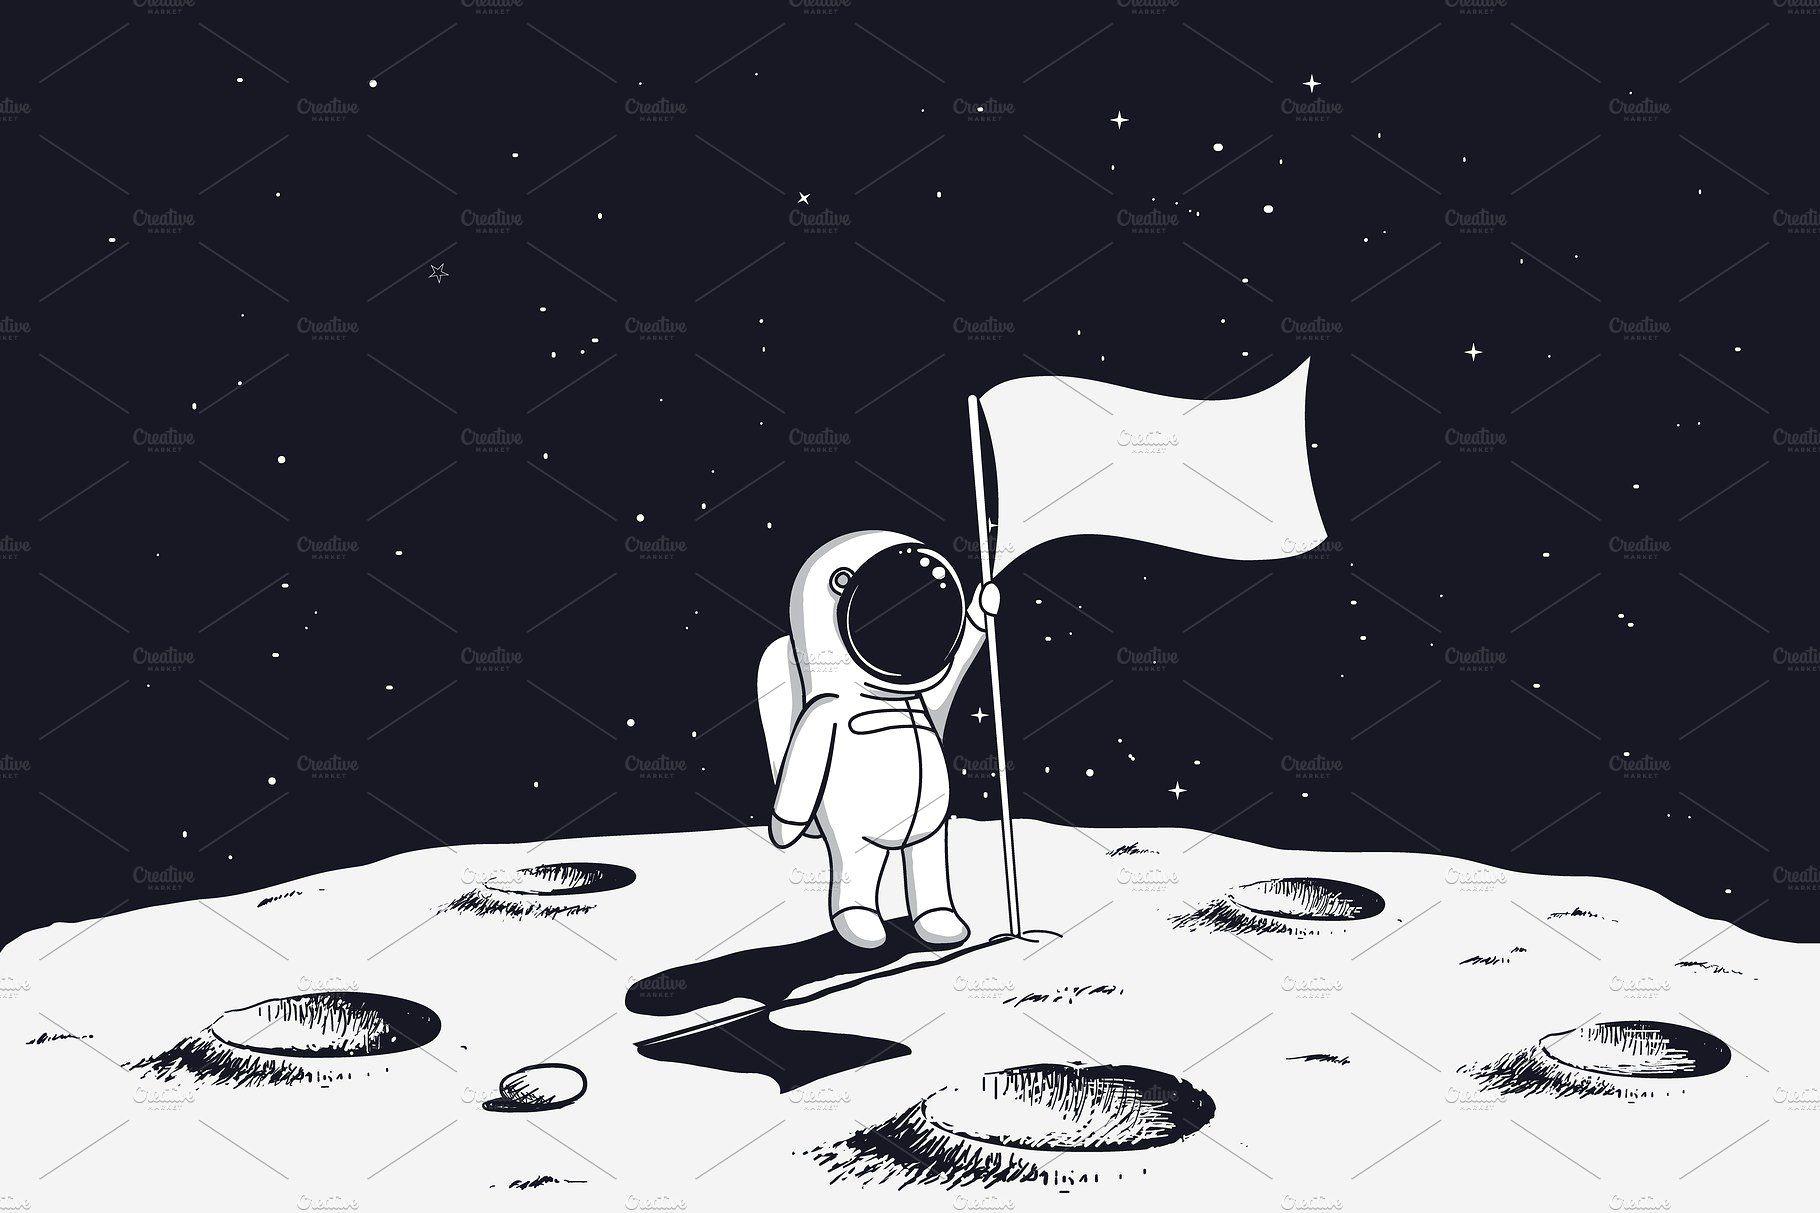 Astronaut On Moon With Flag Astronaut Art Astronaut Drawing Space Drawings Astronaut on moon with flag wallpaper